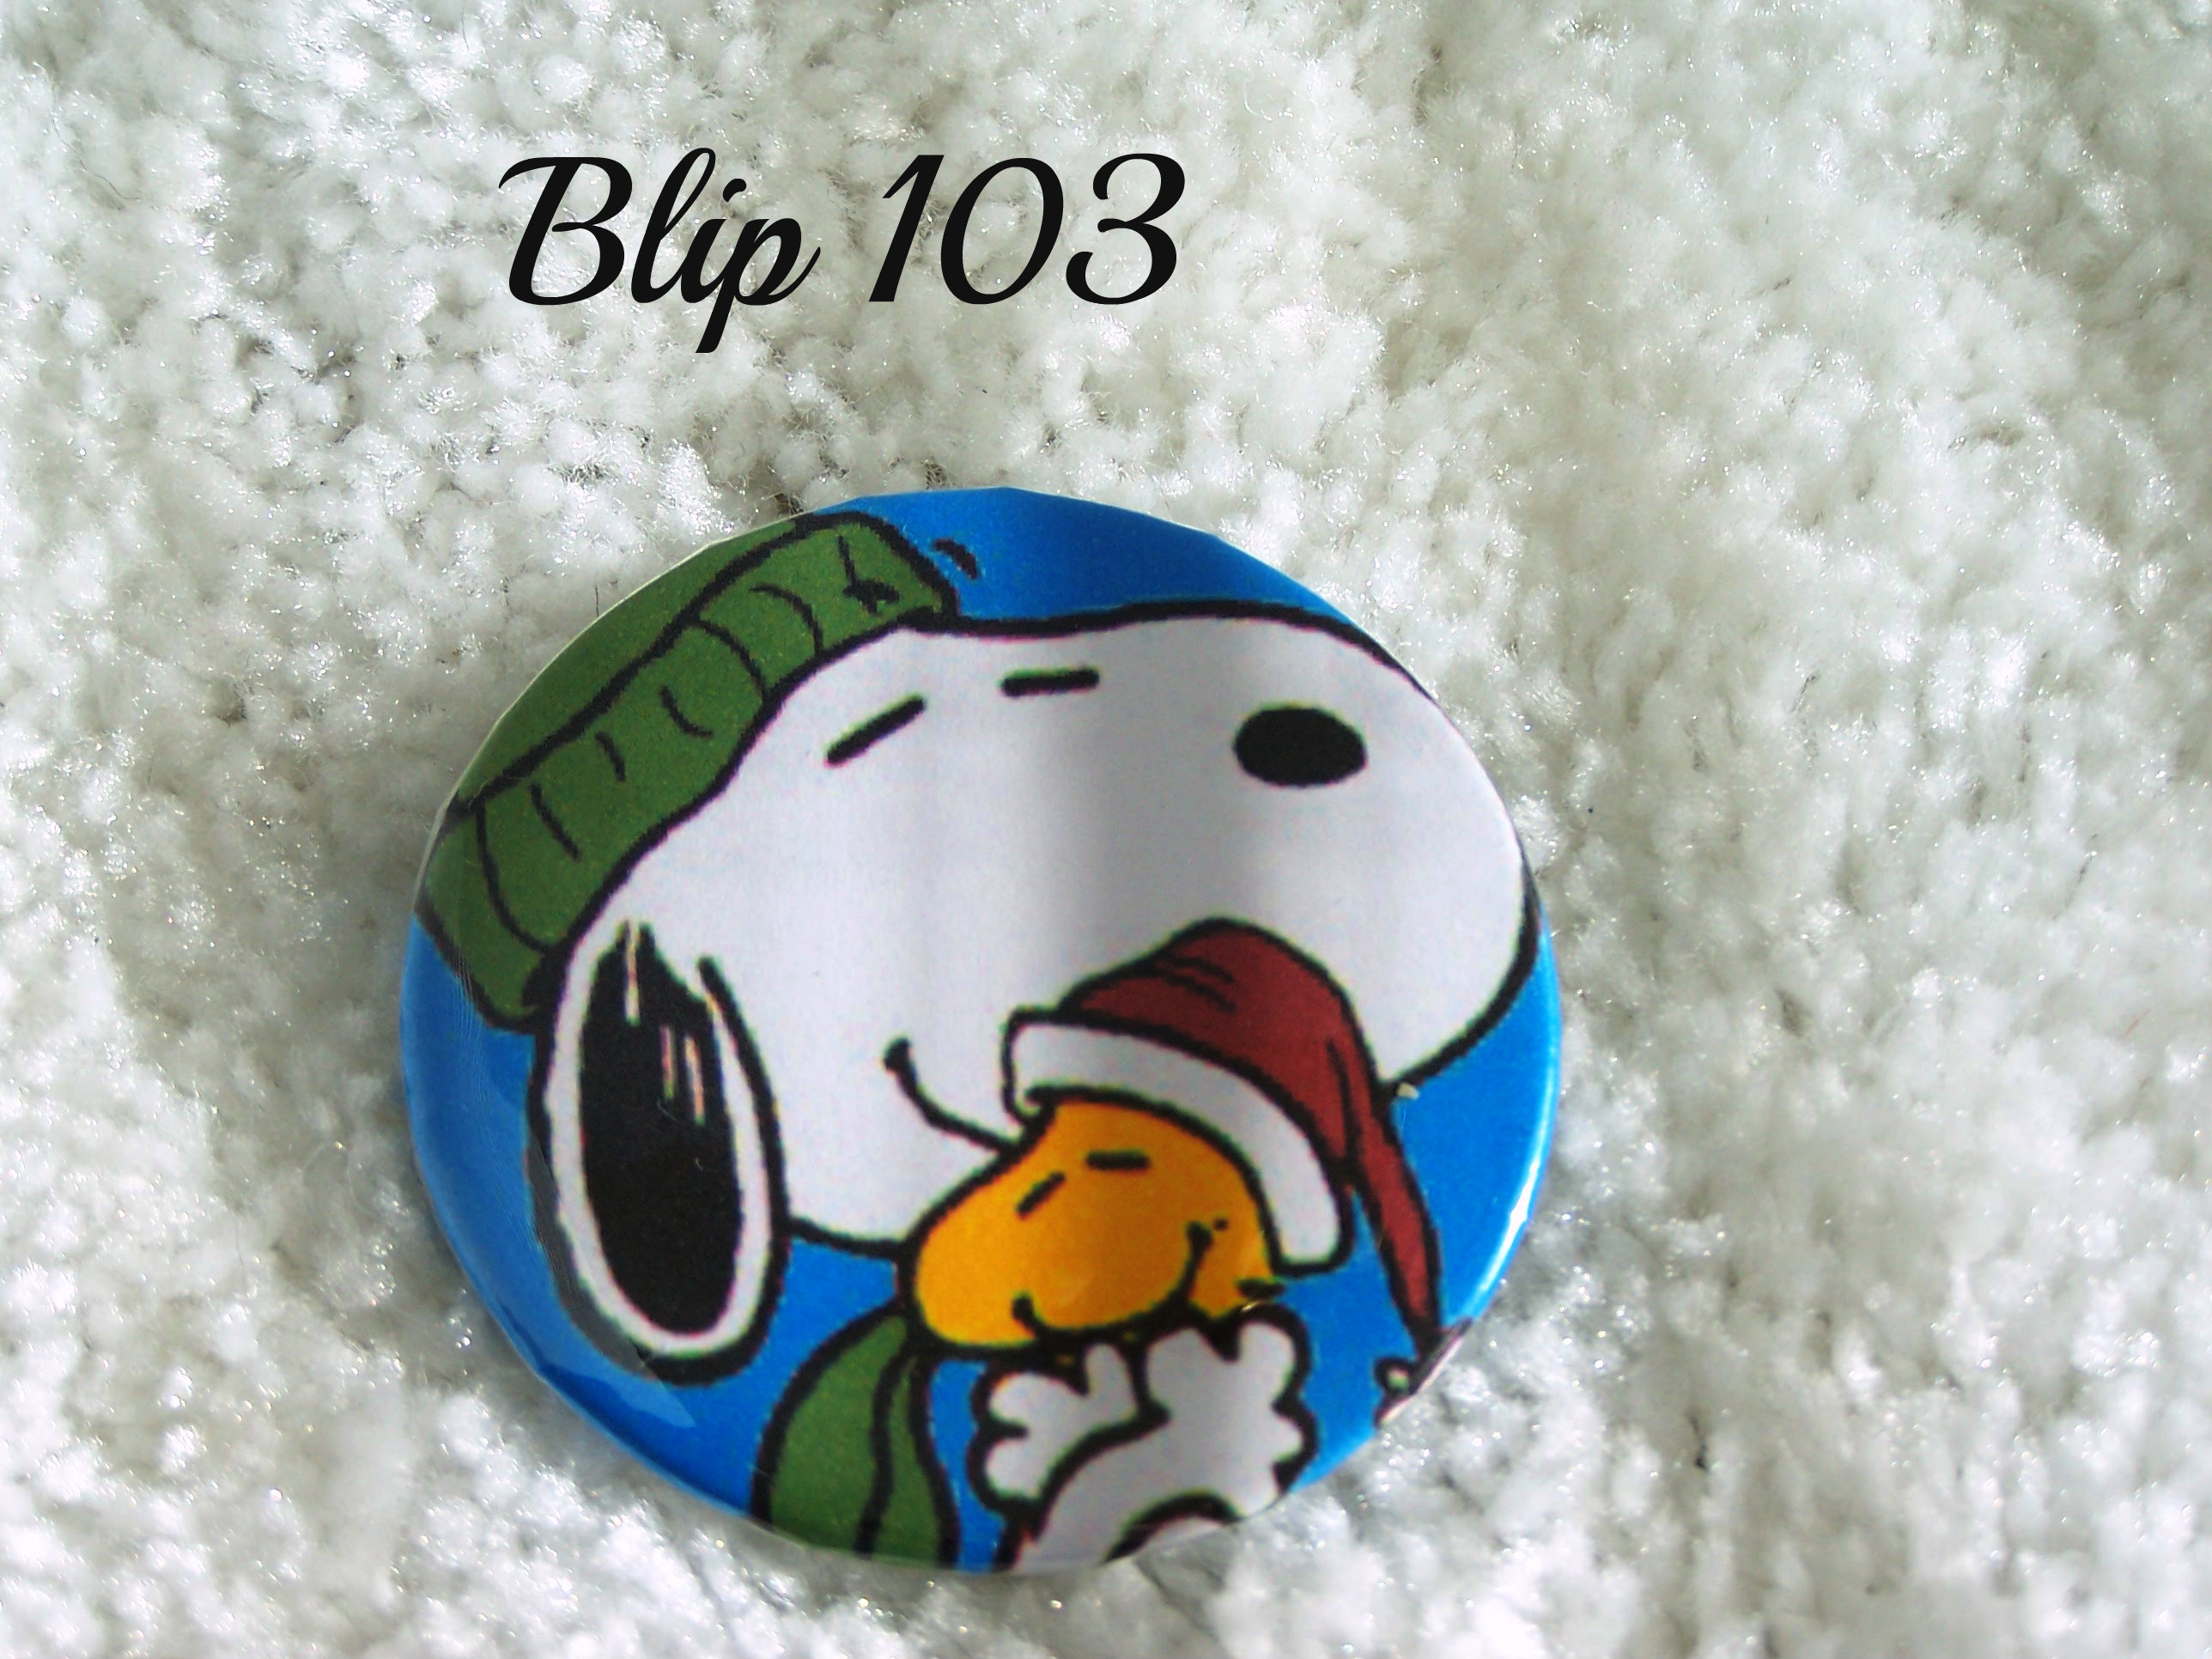 christmassnoopywoodstockblipjpg original - Snoopy And Woodstock Christmas